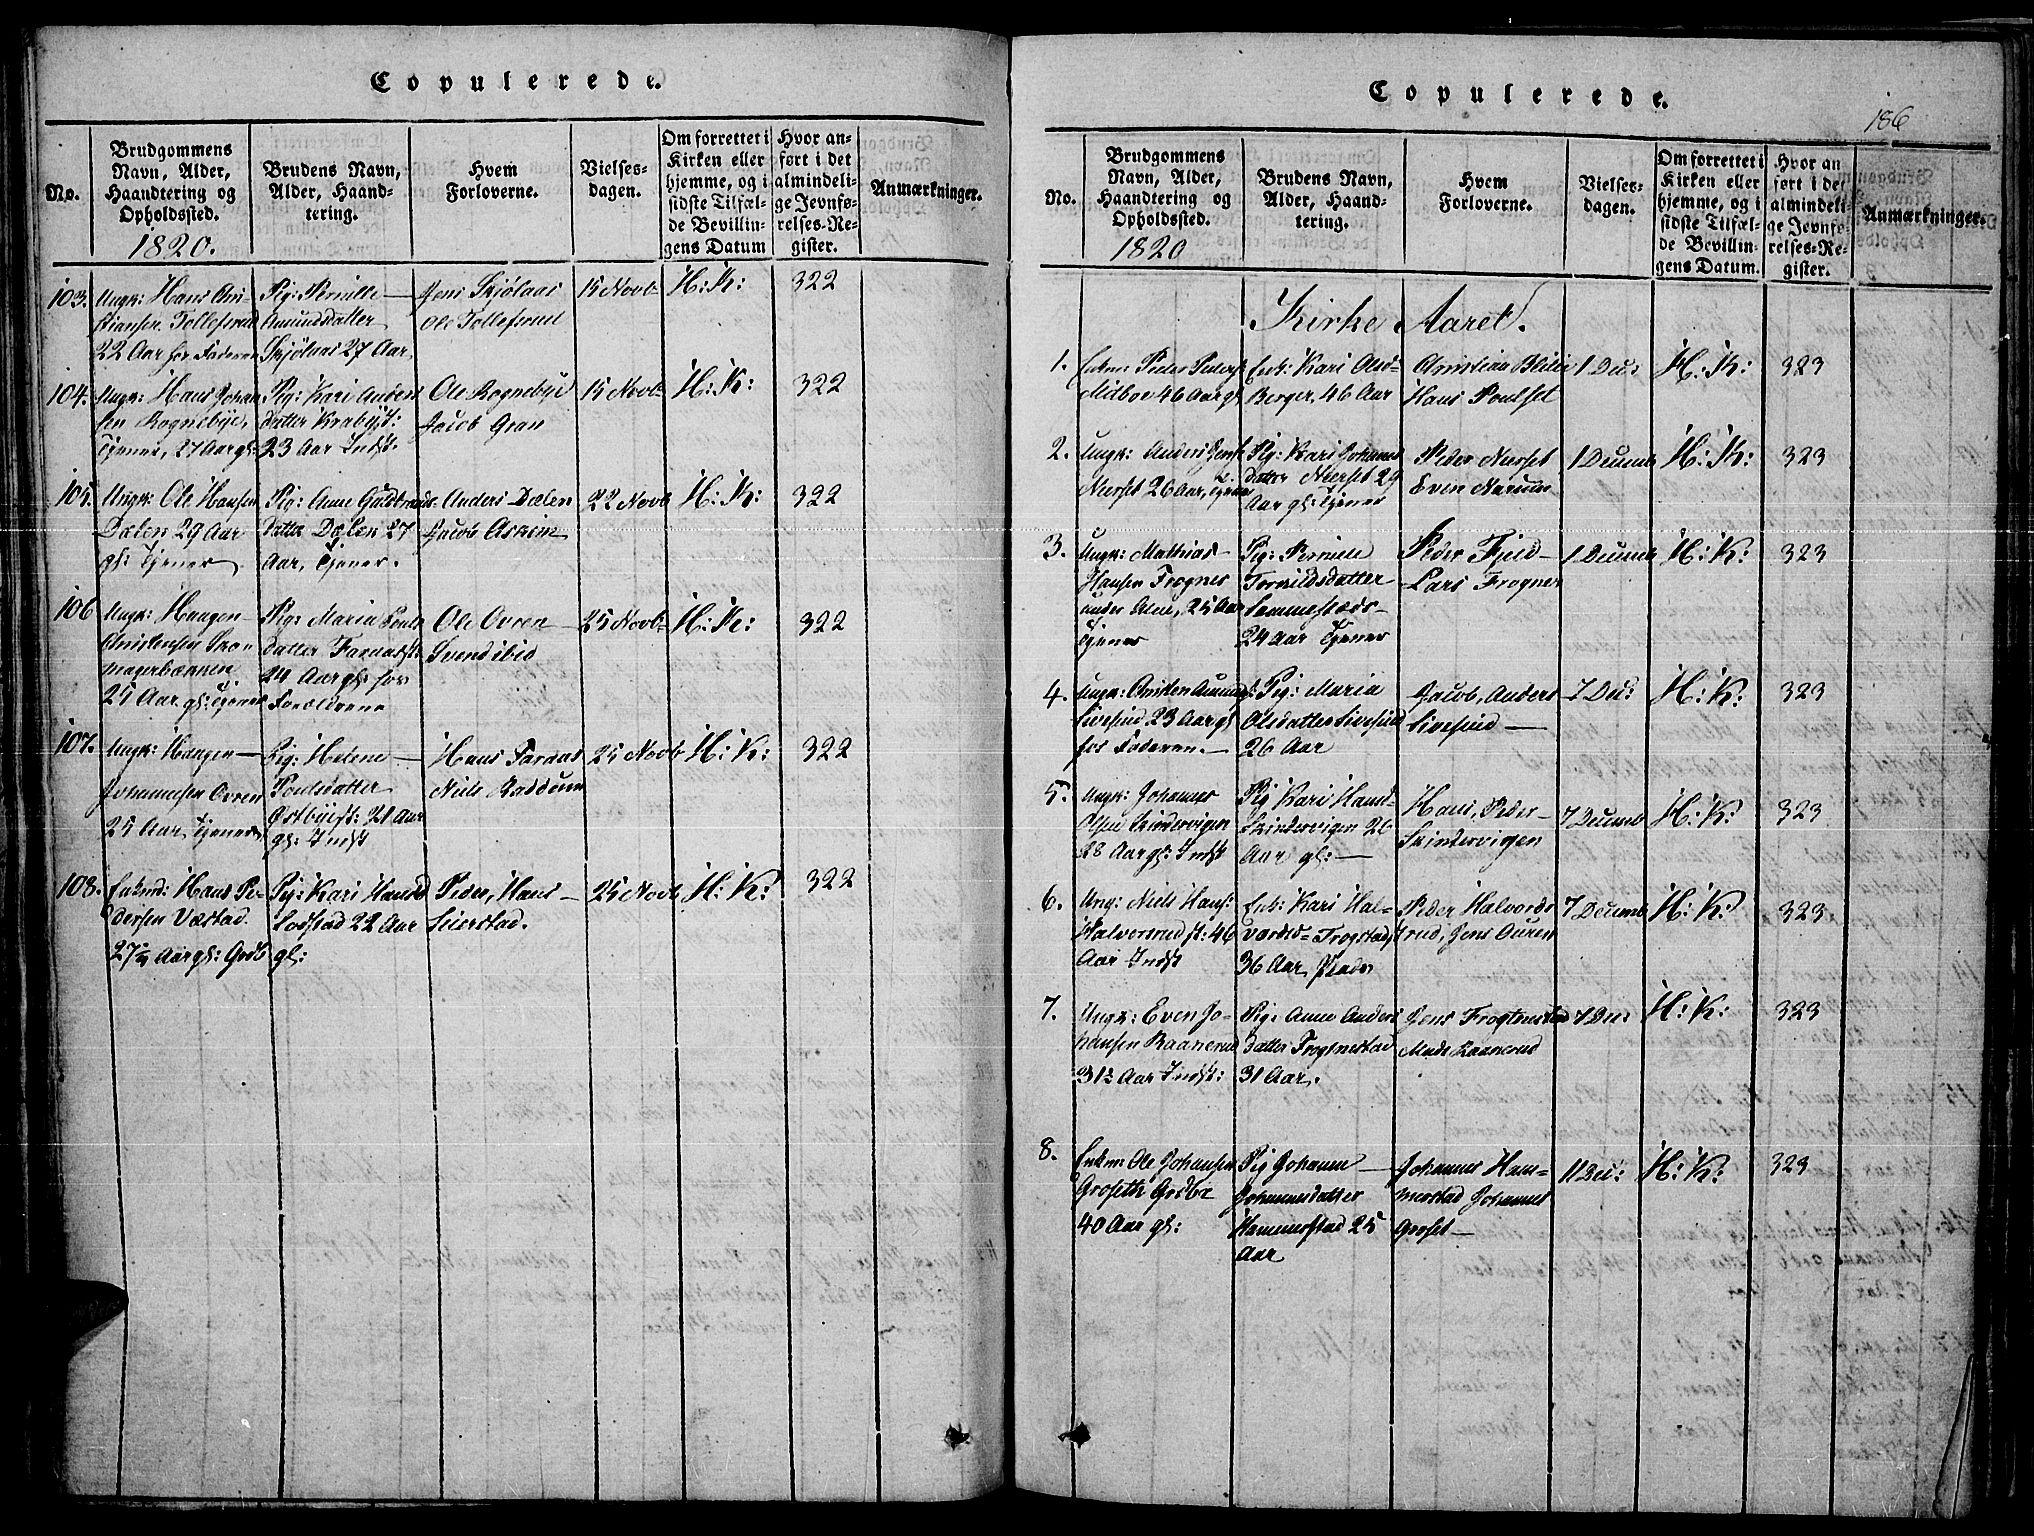 SAH, Toten prestekontor, Ministerialbok nr. 10, 1820-1828, s. 186